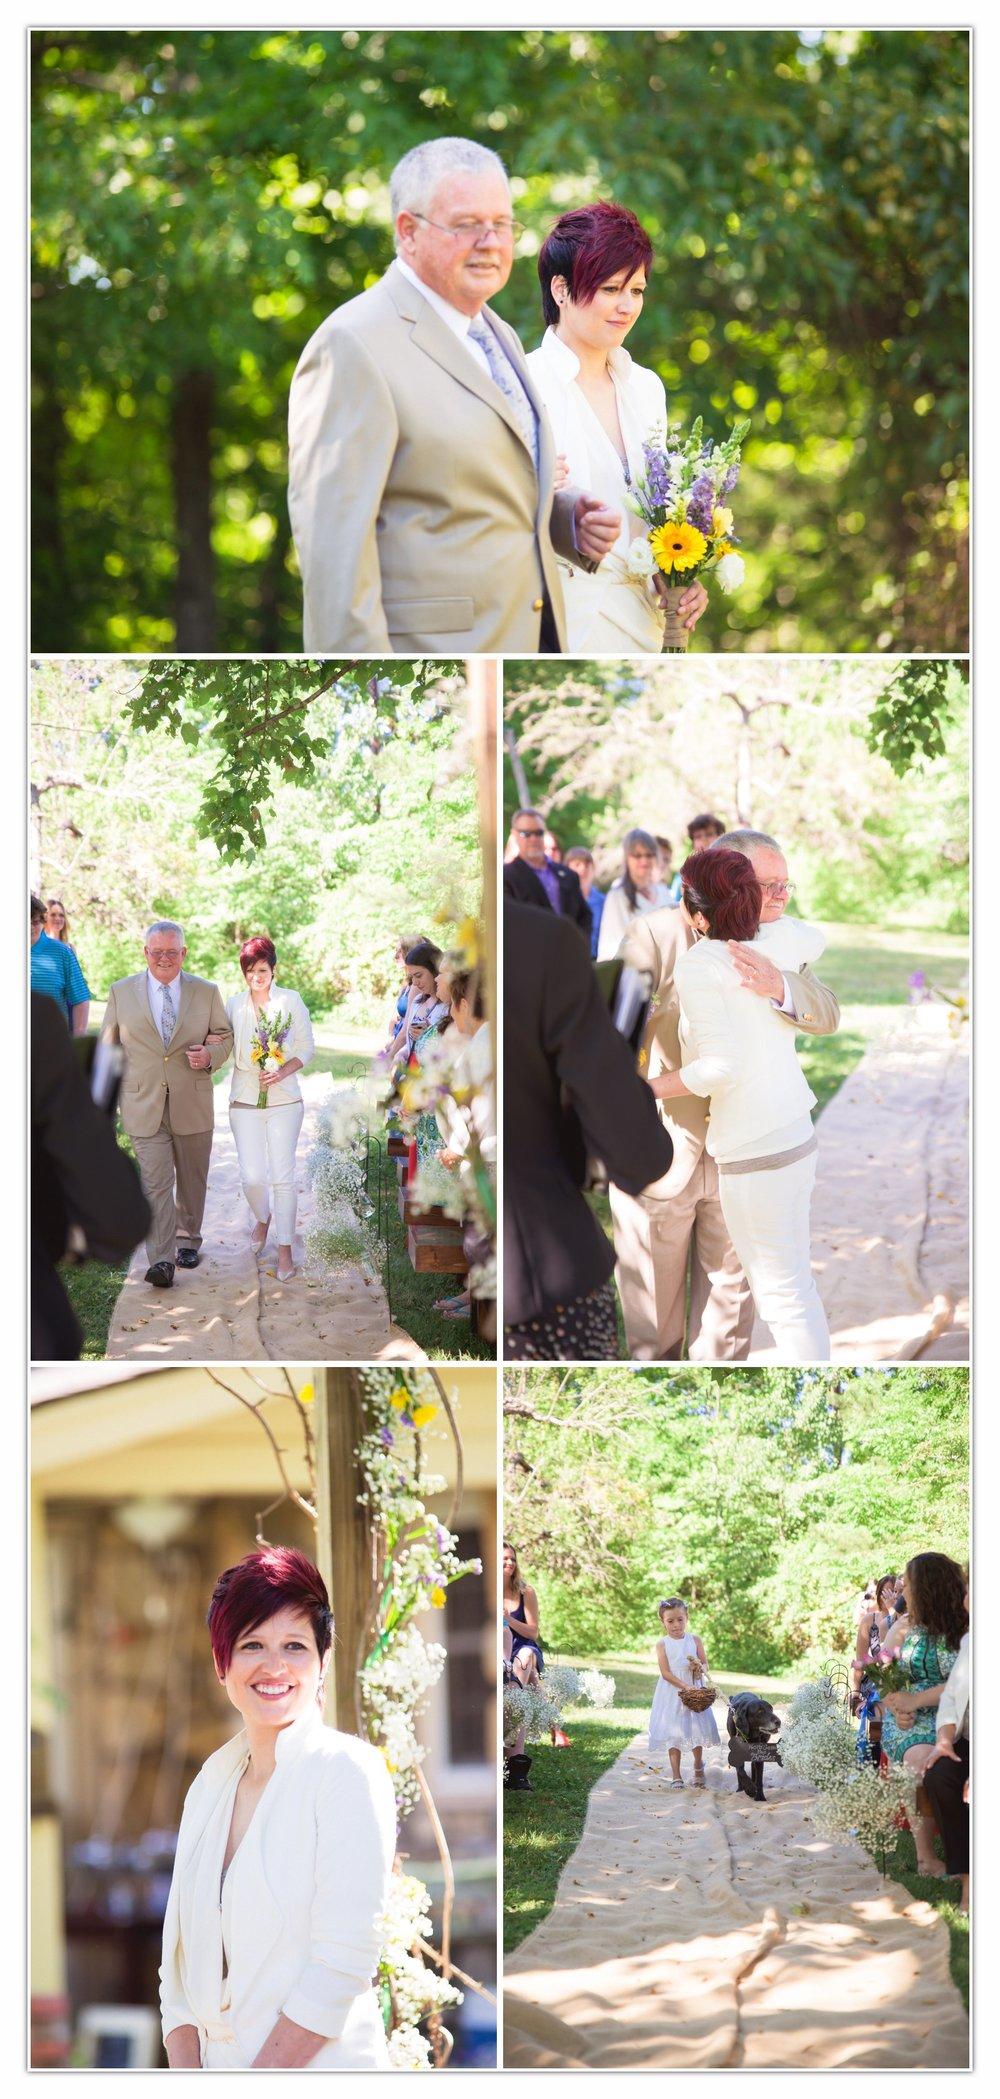 Donnellan Wedding Blog 9.jpg